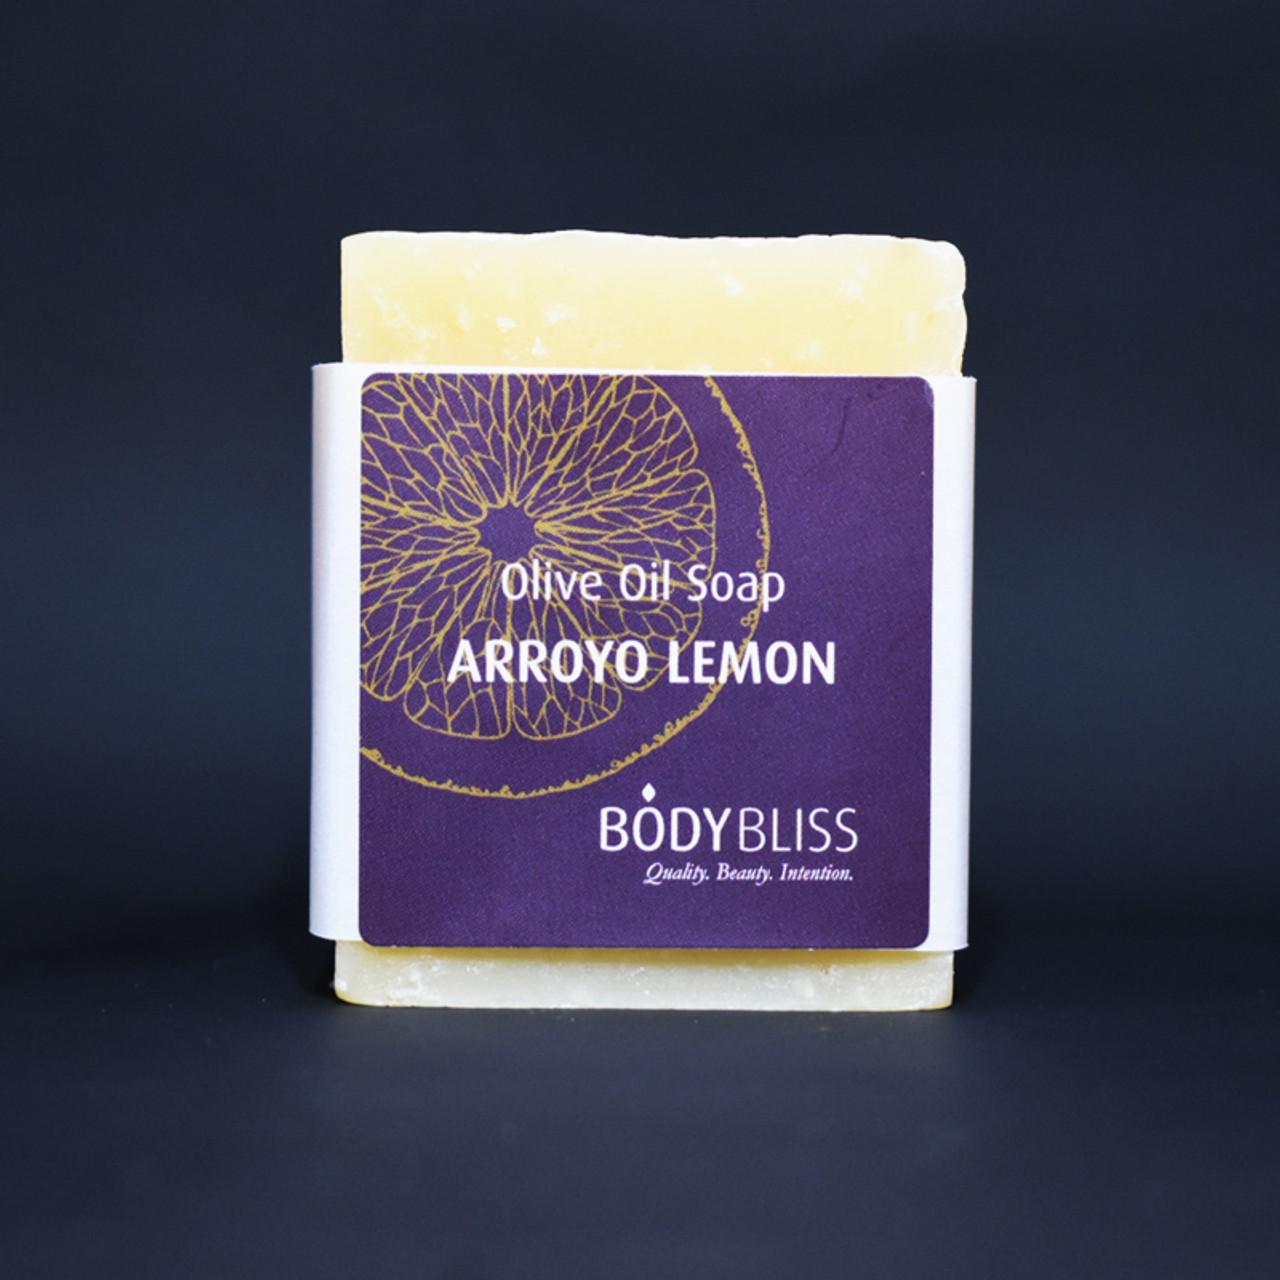 Arroyo Lemon Olive Oil Soap